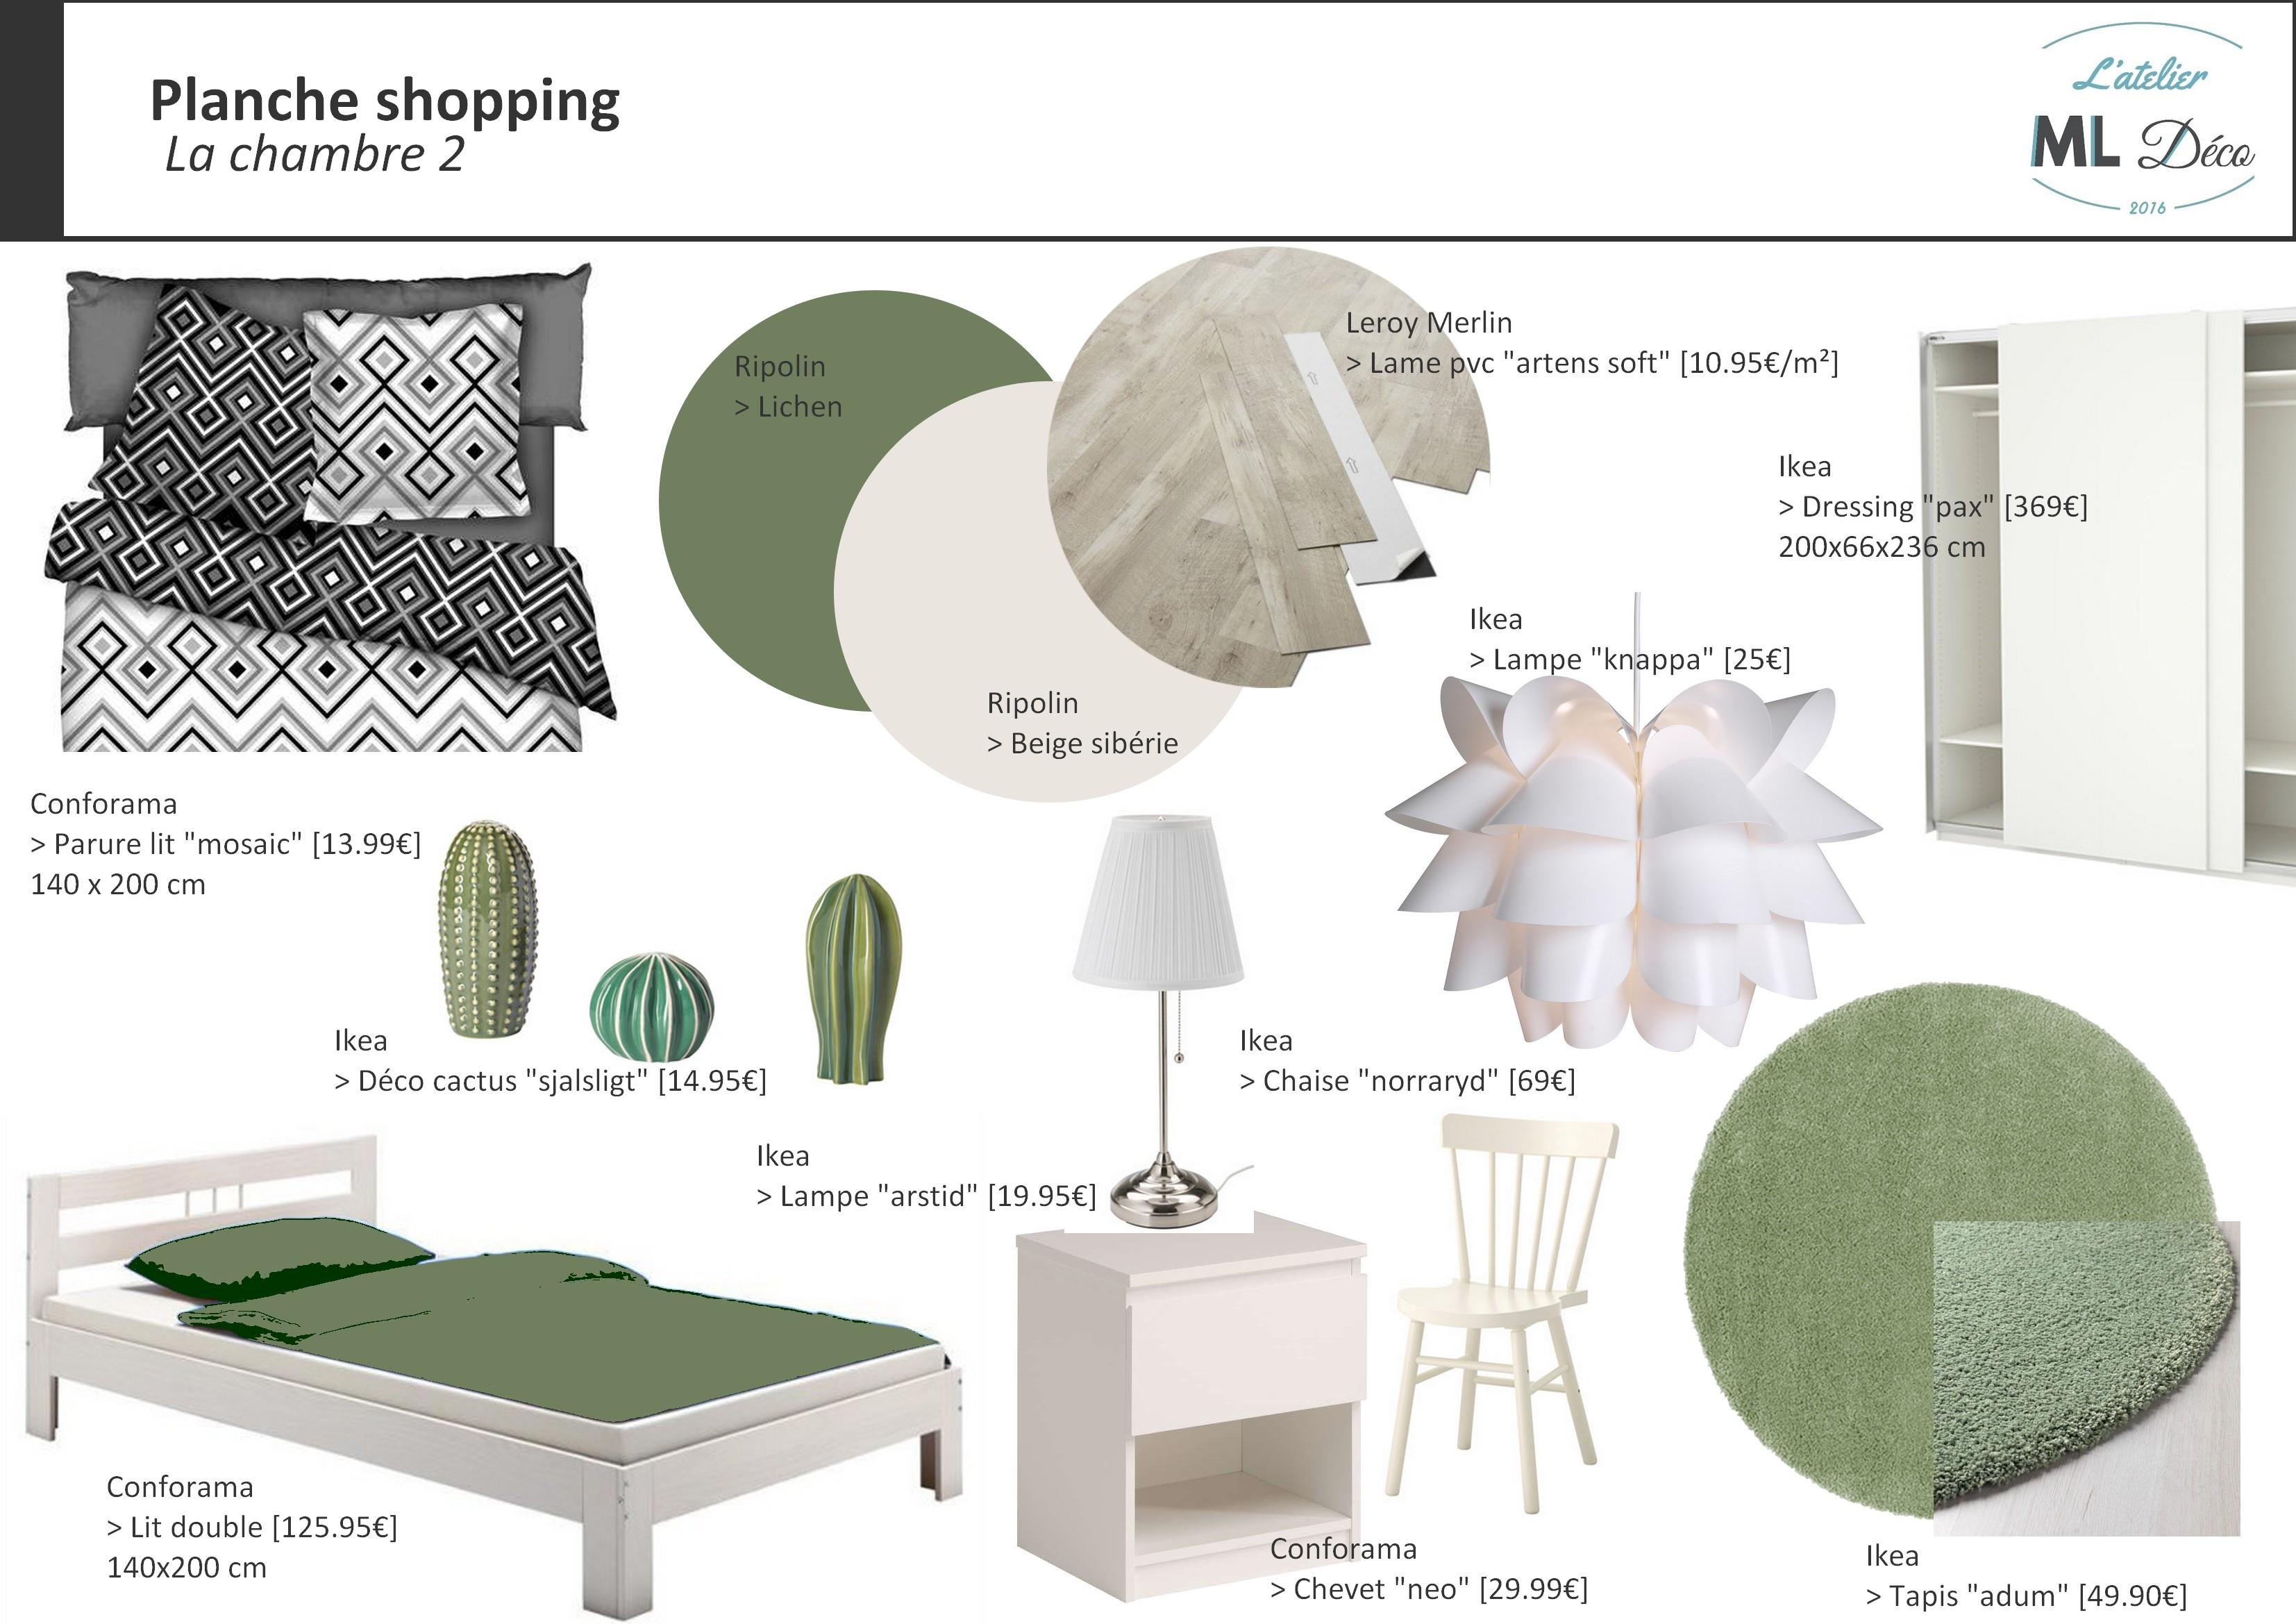 Planche shopping - Chambre 2